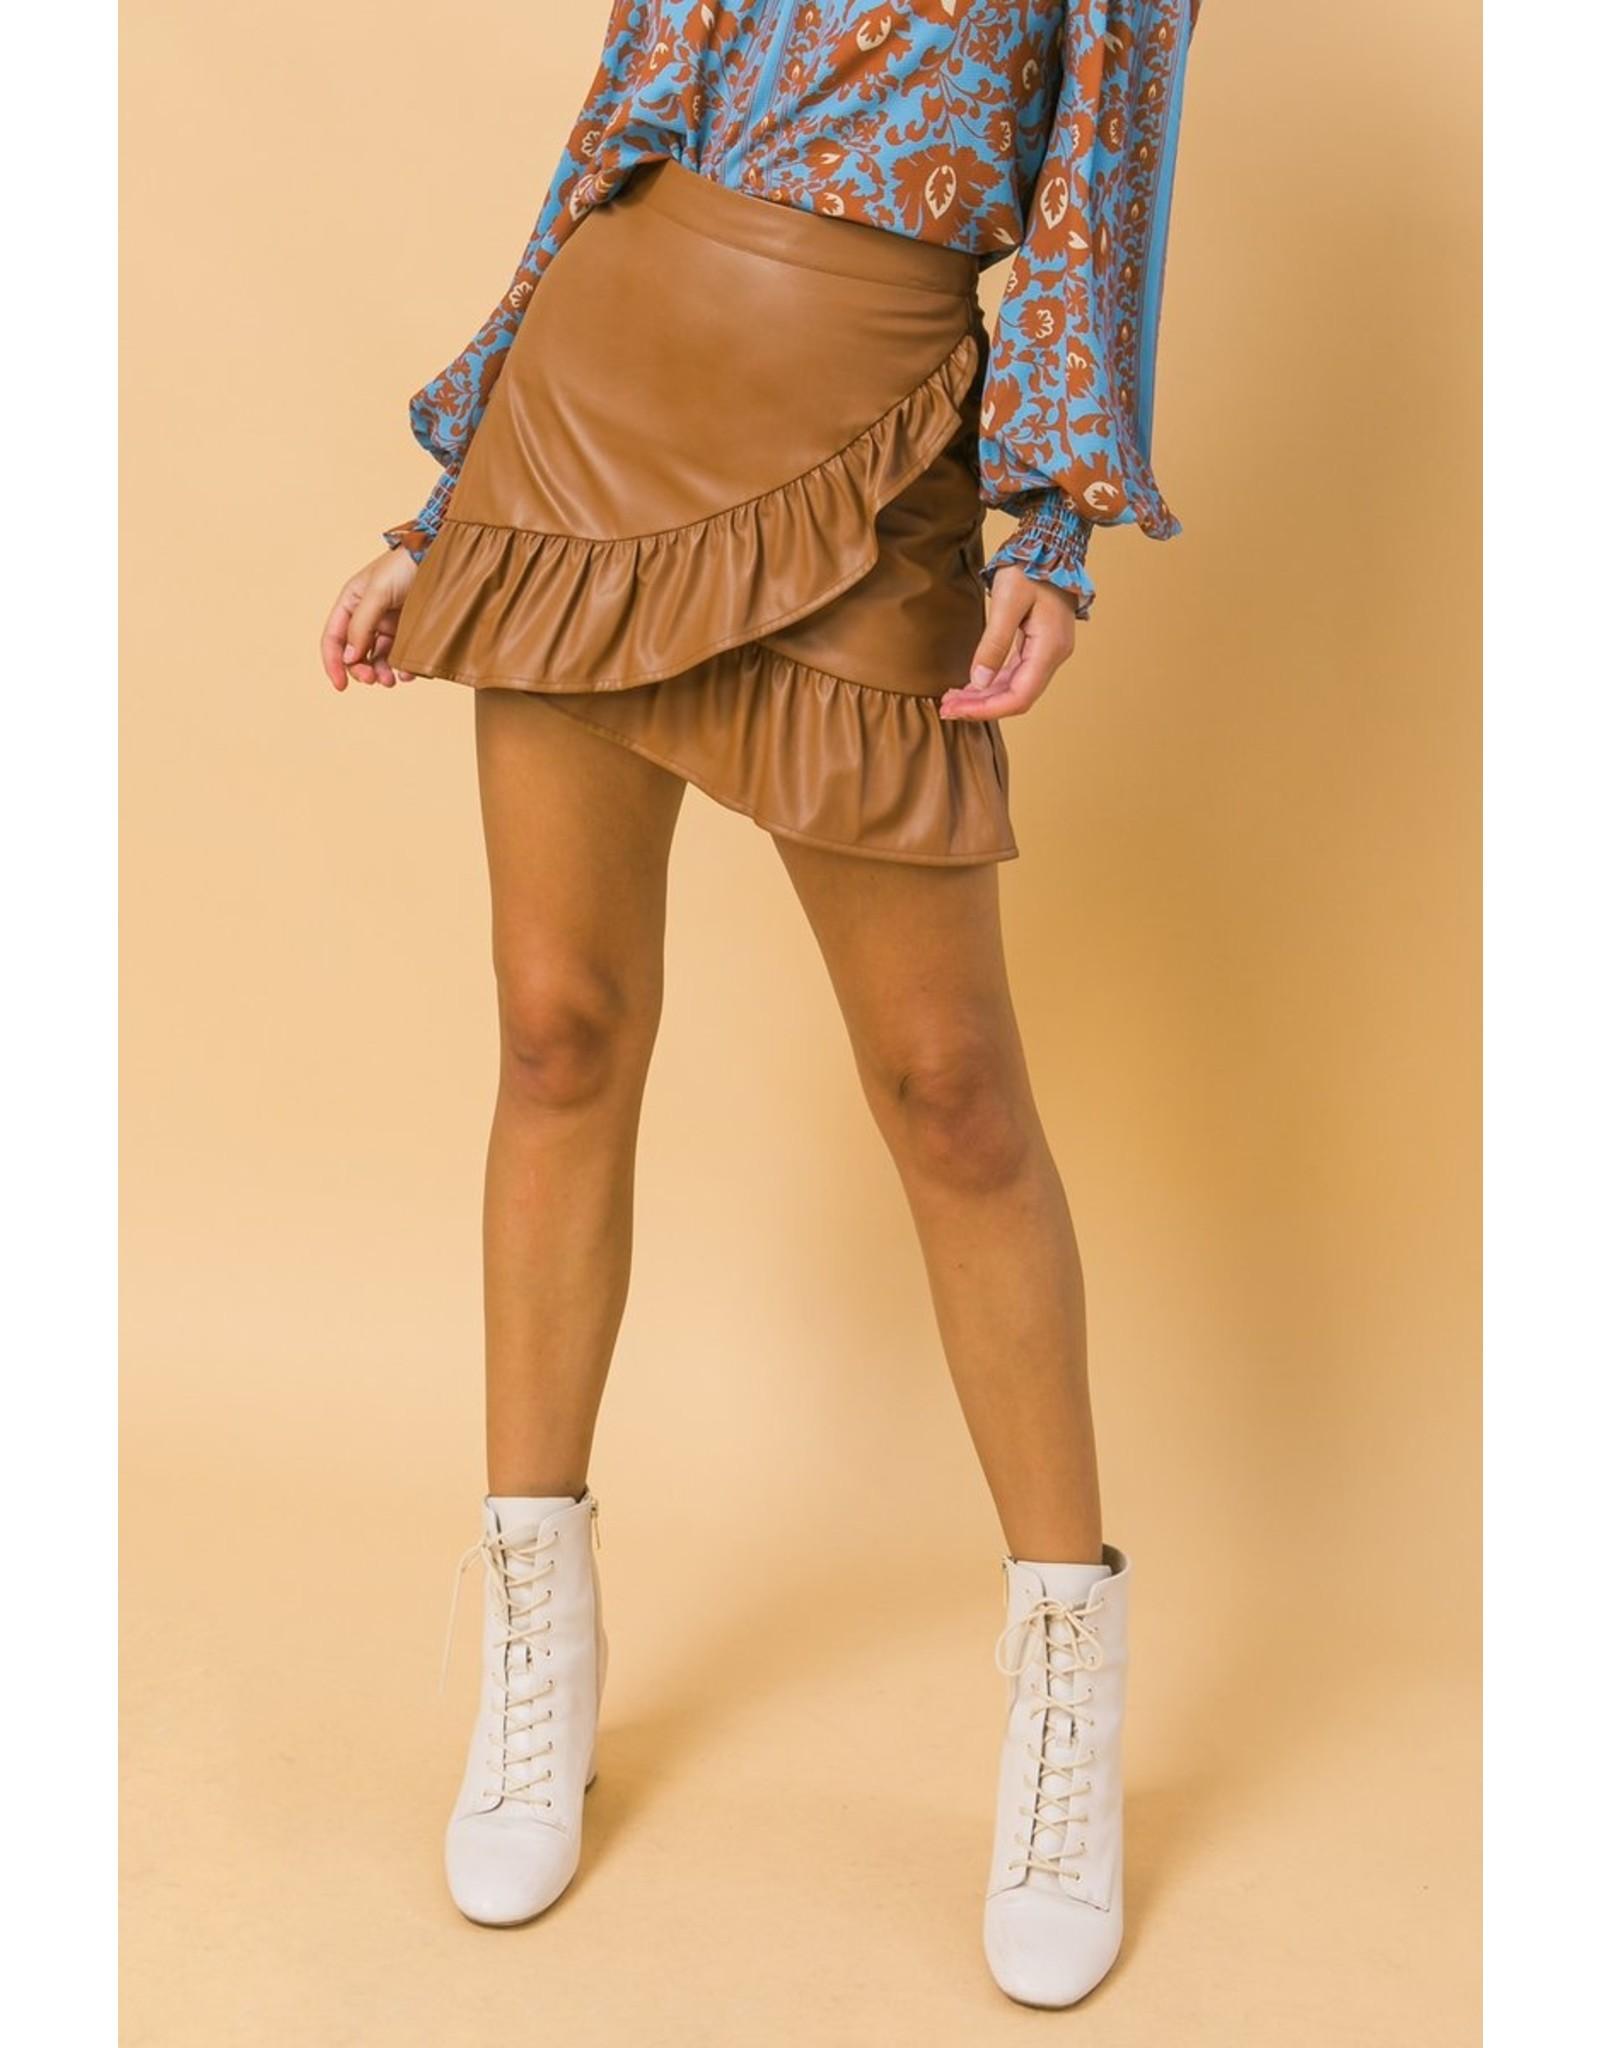 Ruffle Hem Pleather Skirt - Brown